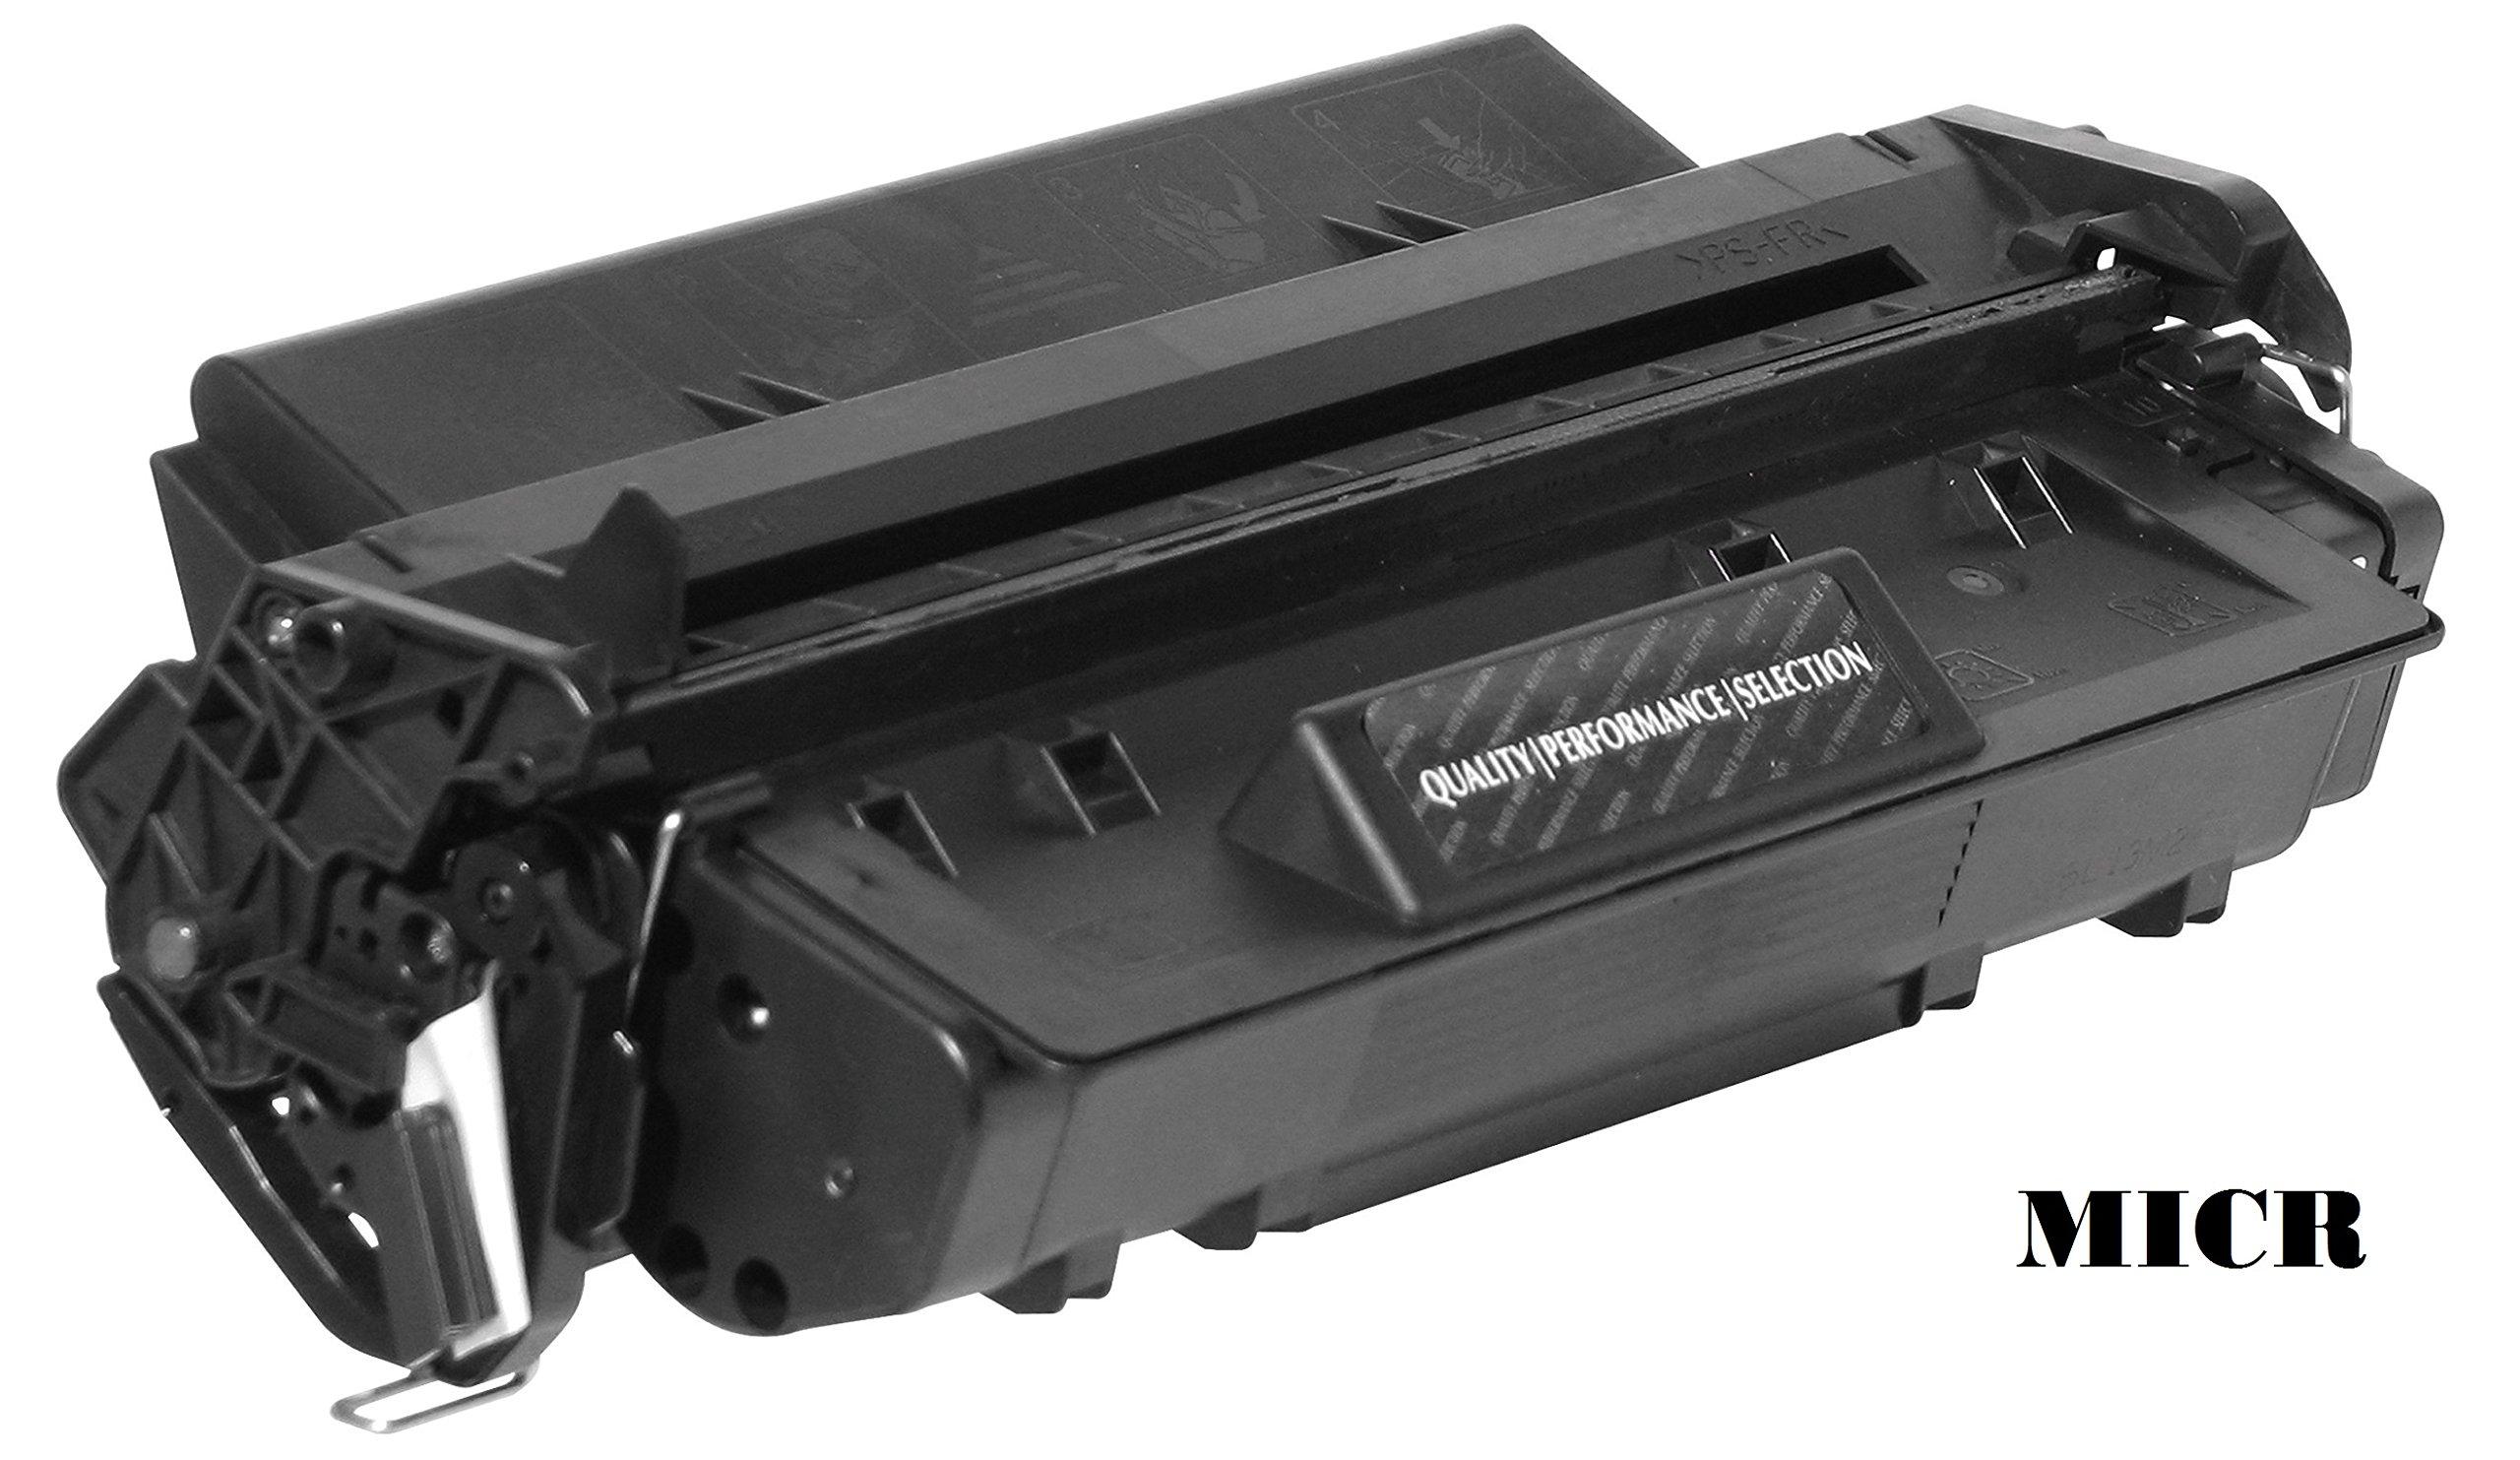 GLB Premium Quality Compatible Replacement for HP 96A / HP C4096A Black Laser Toner Cartridge for HP Laserjet 2100, 2100M, 2100se,2100TN,2100xi,2200, 2200D,2200DN,2200DT,2200DTN Printers(MICR)